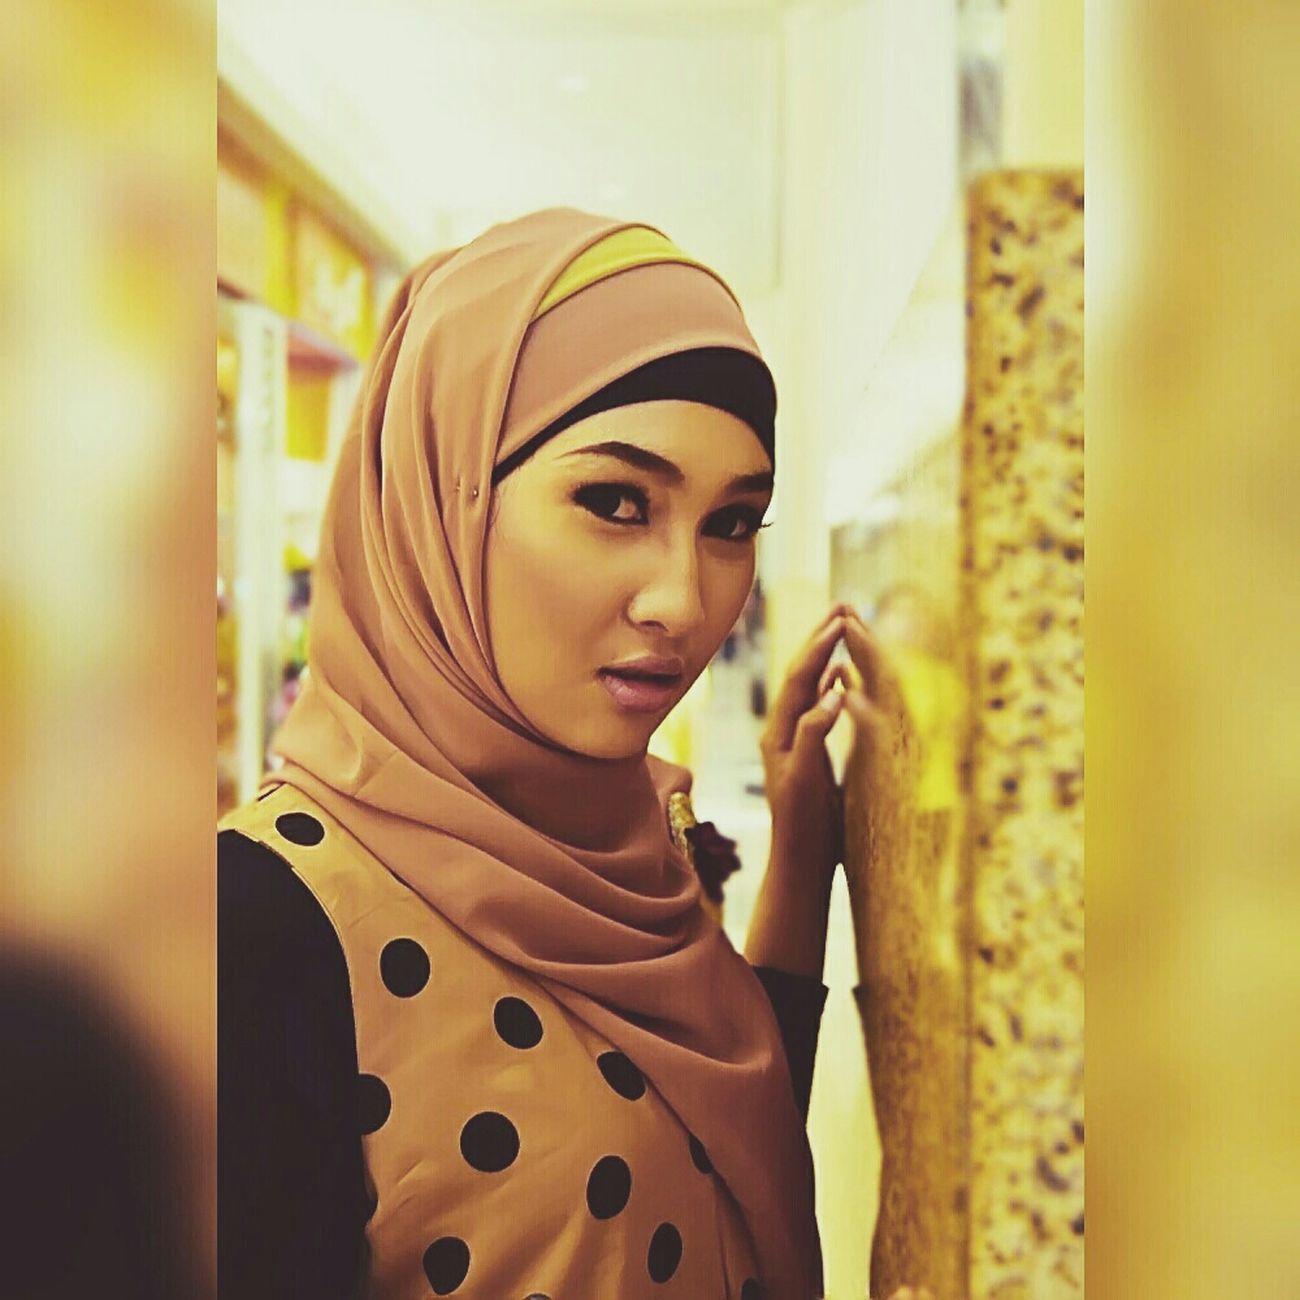 Muslimahfashion Muslimstyle Hijabbeauty Hijabfashion Hijabstyle  Muslim Model Amodelssurabaya Www.amanagementsby.web.id   model: ghea   mua & hijab: adie a iskandar   casual ghea